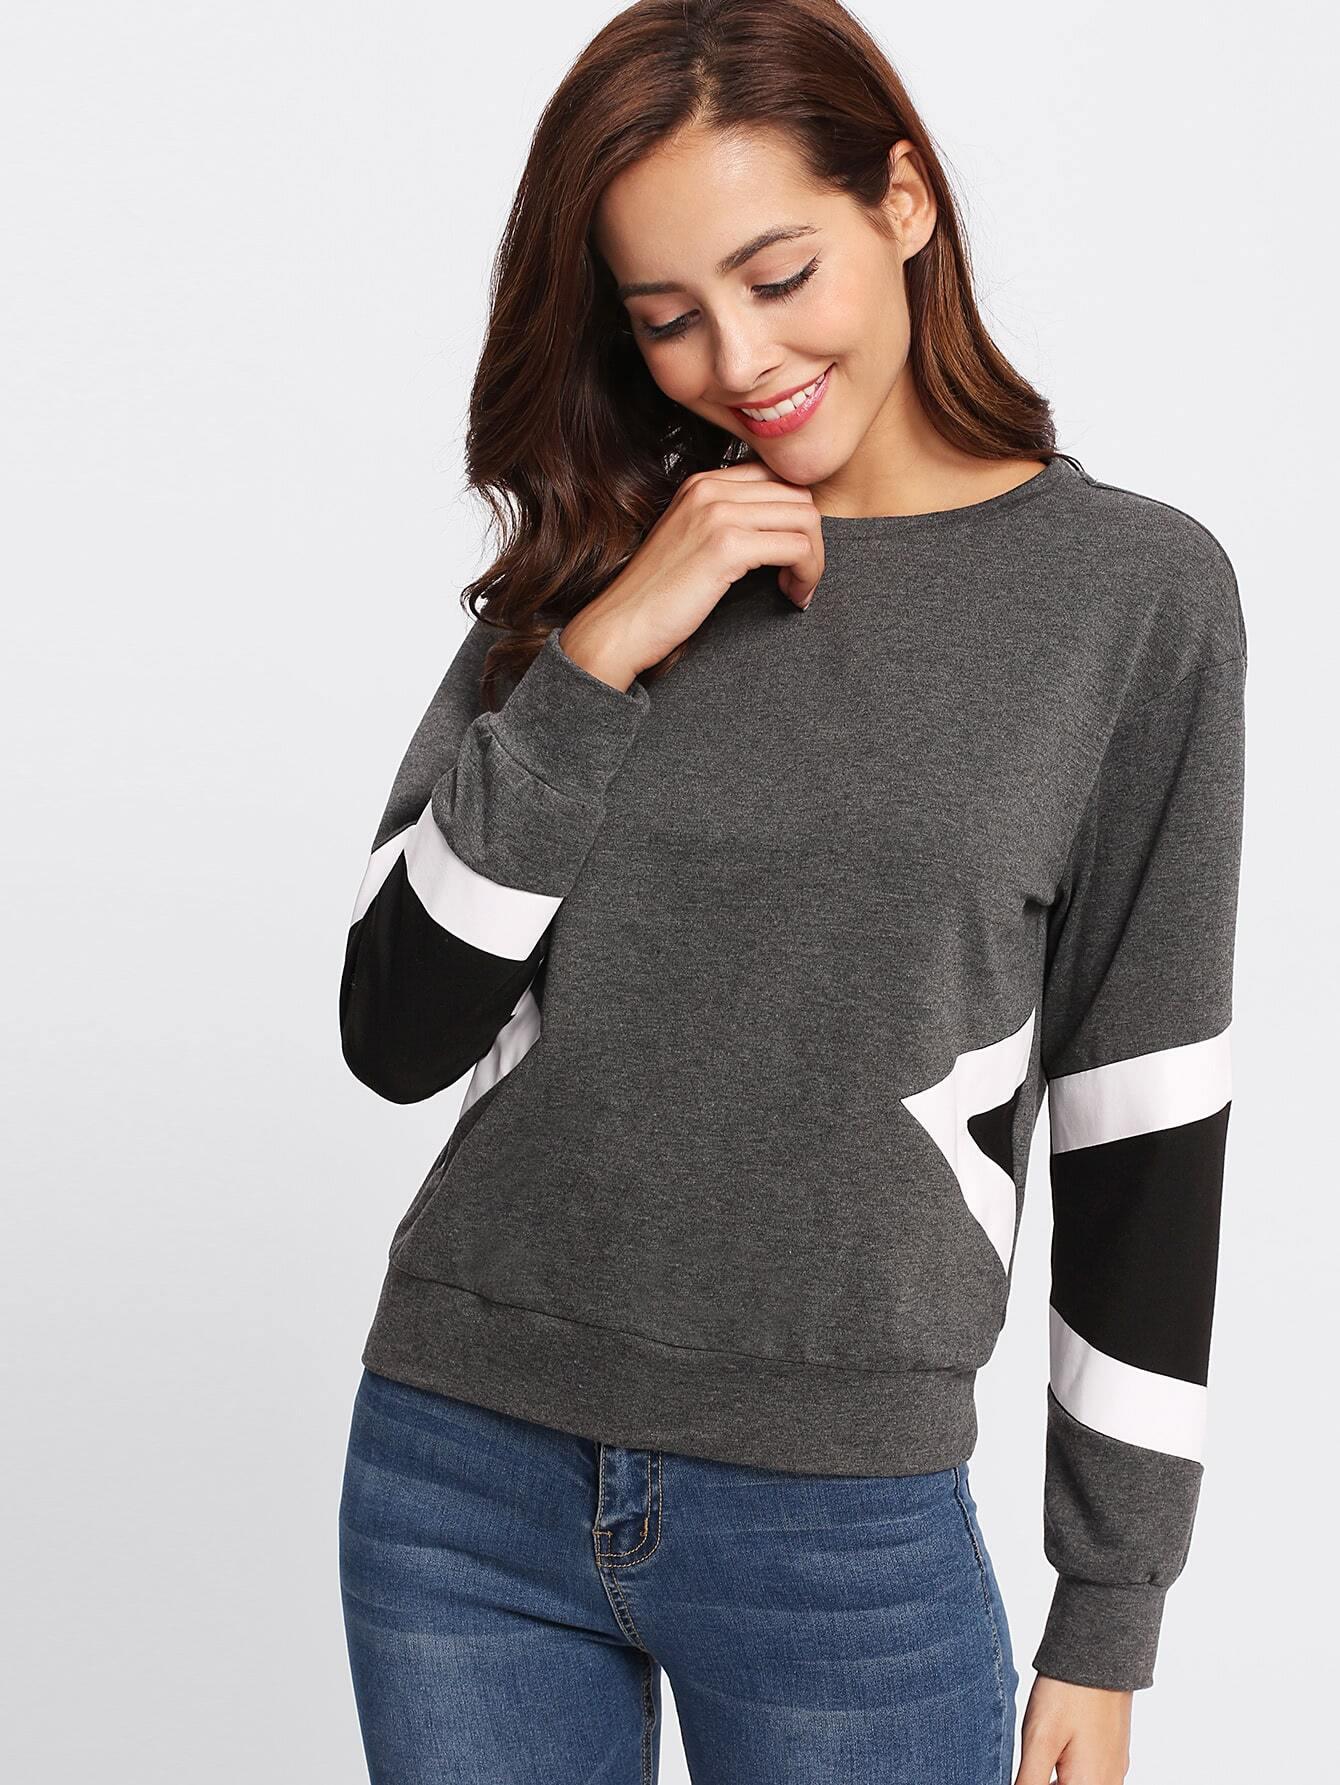 Chevron Print Heather Knit Pullover rabbit print pullover